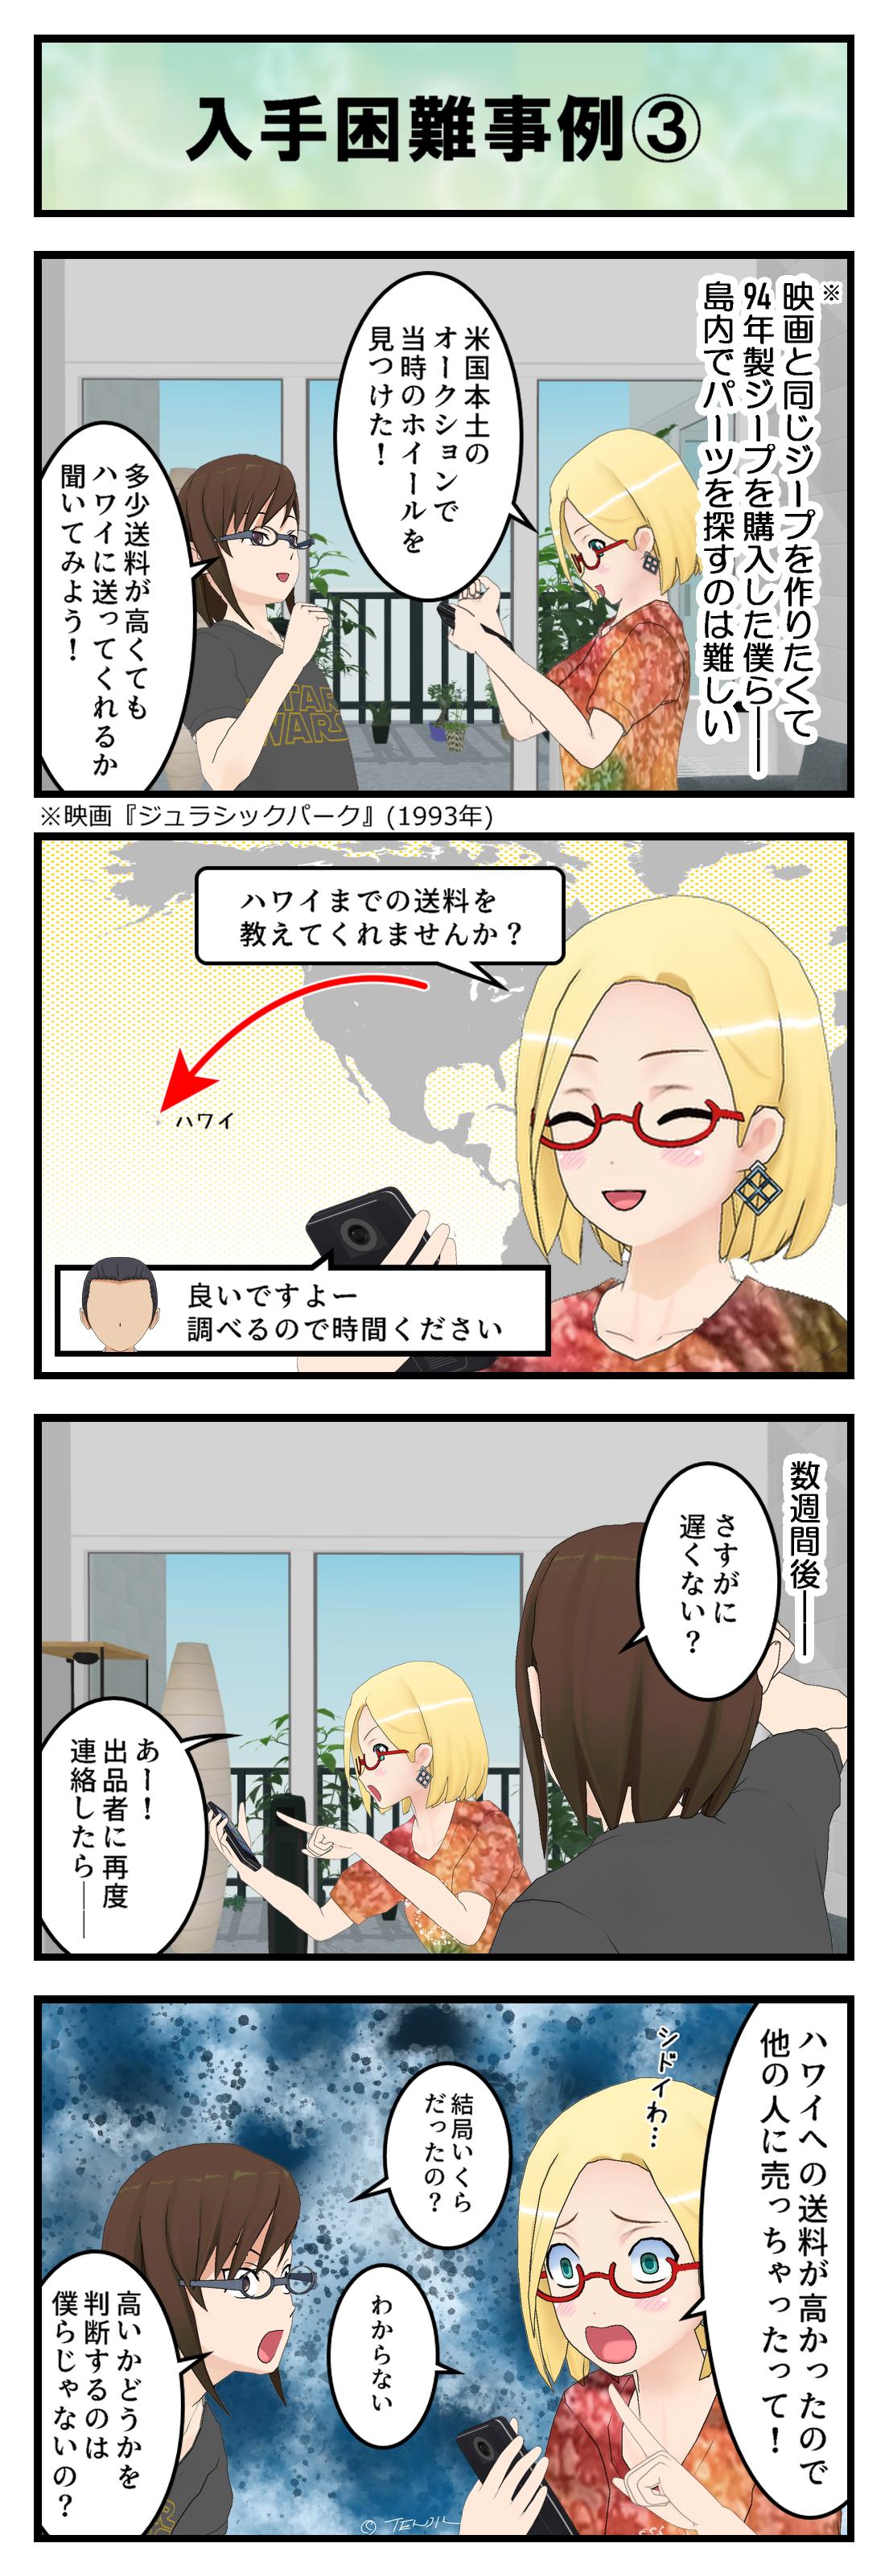 R724_入手困難事例3_001